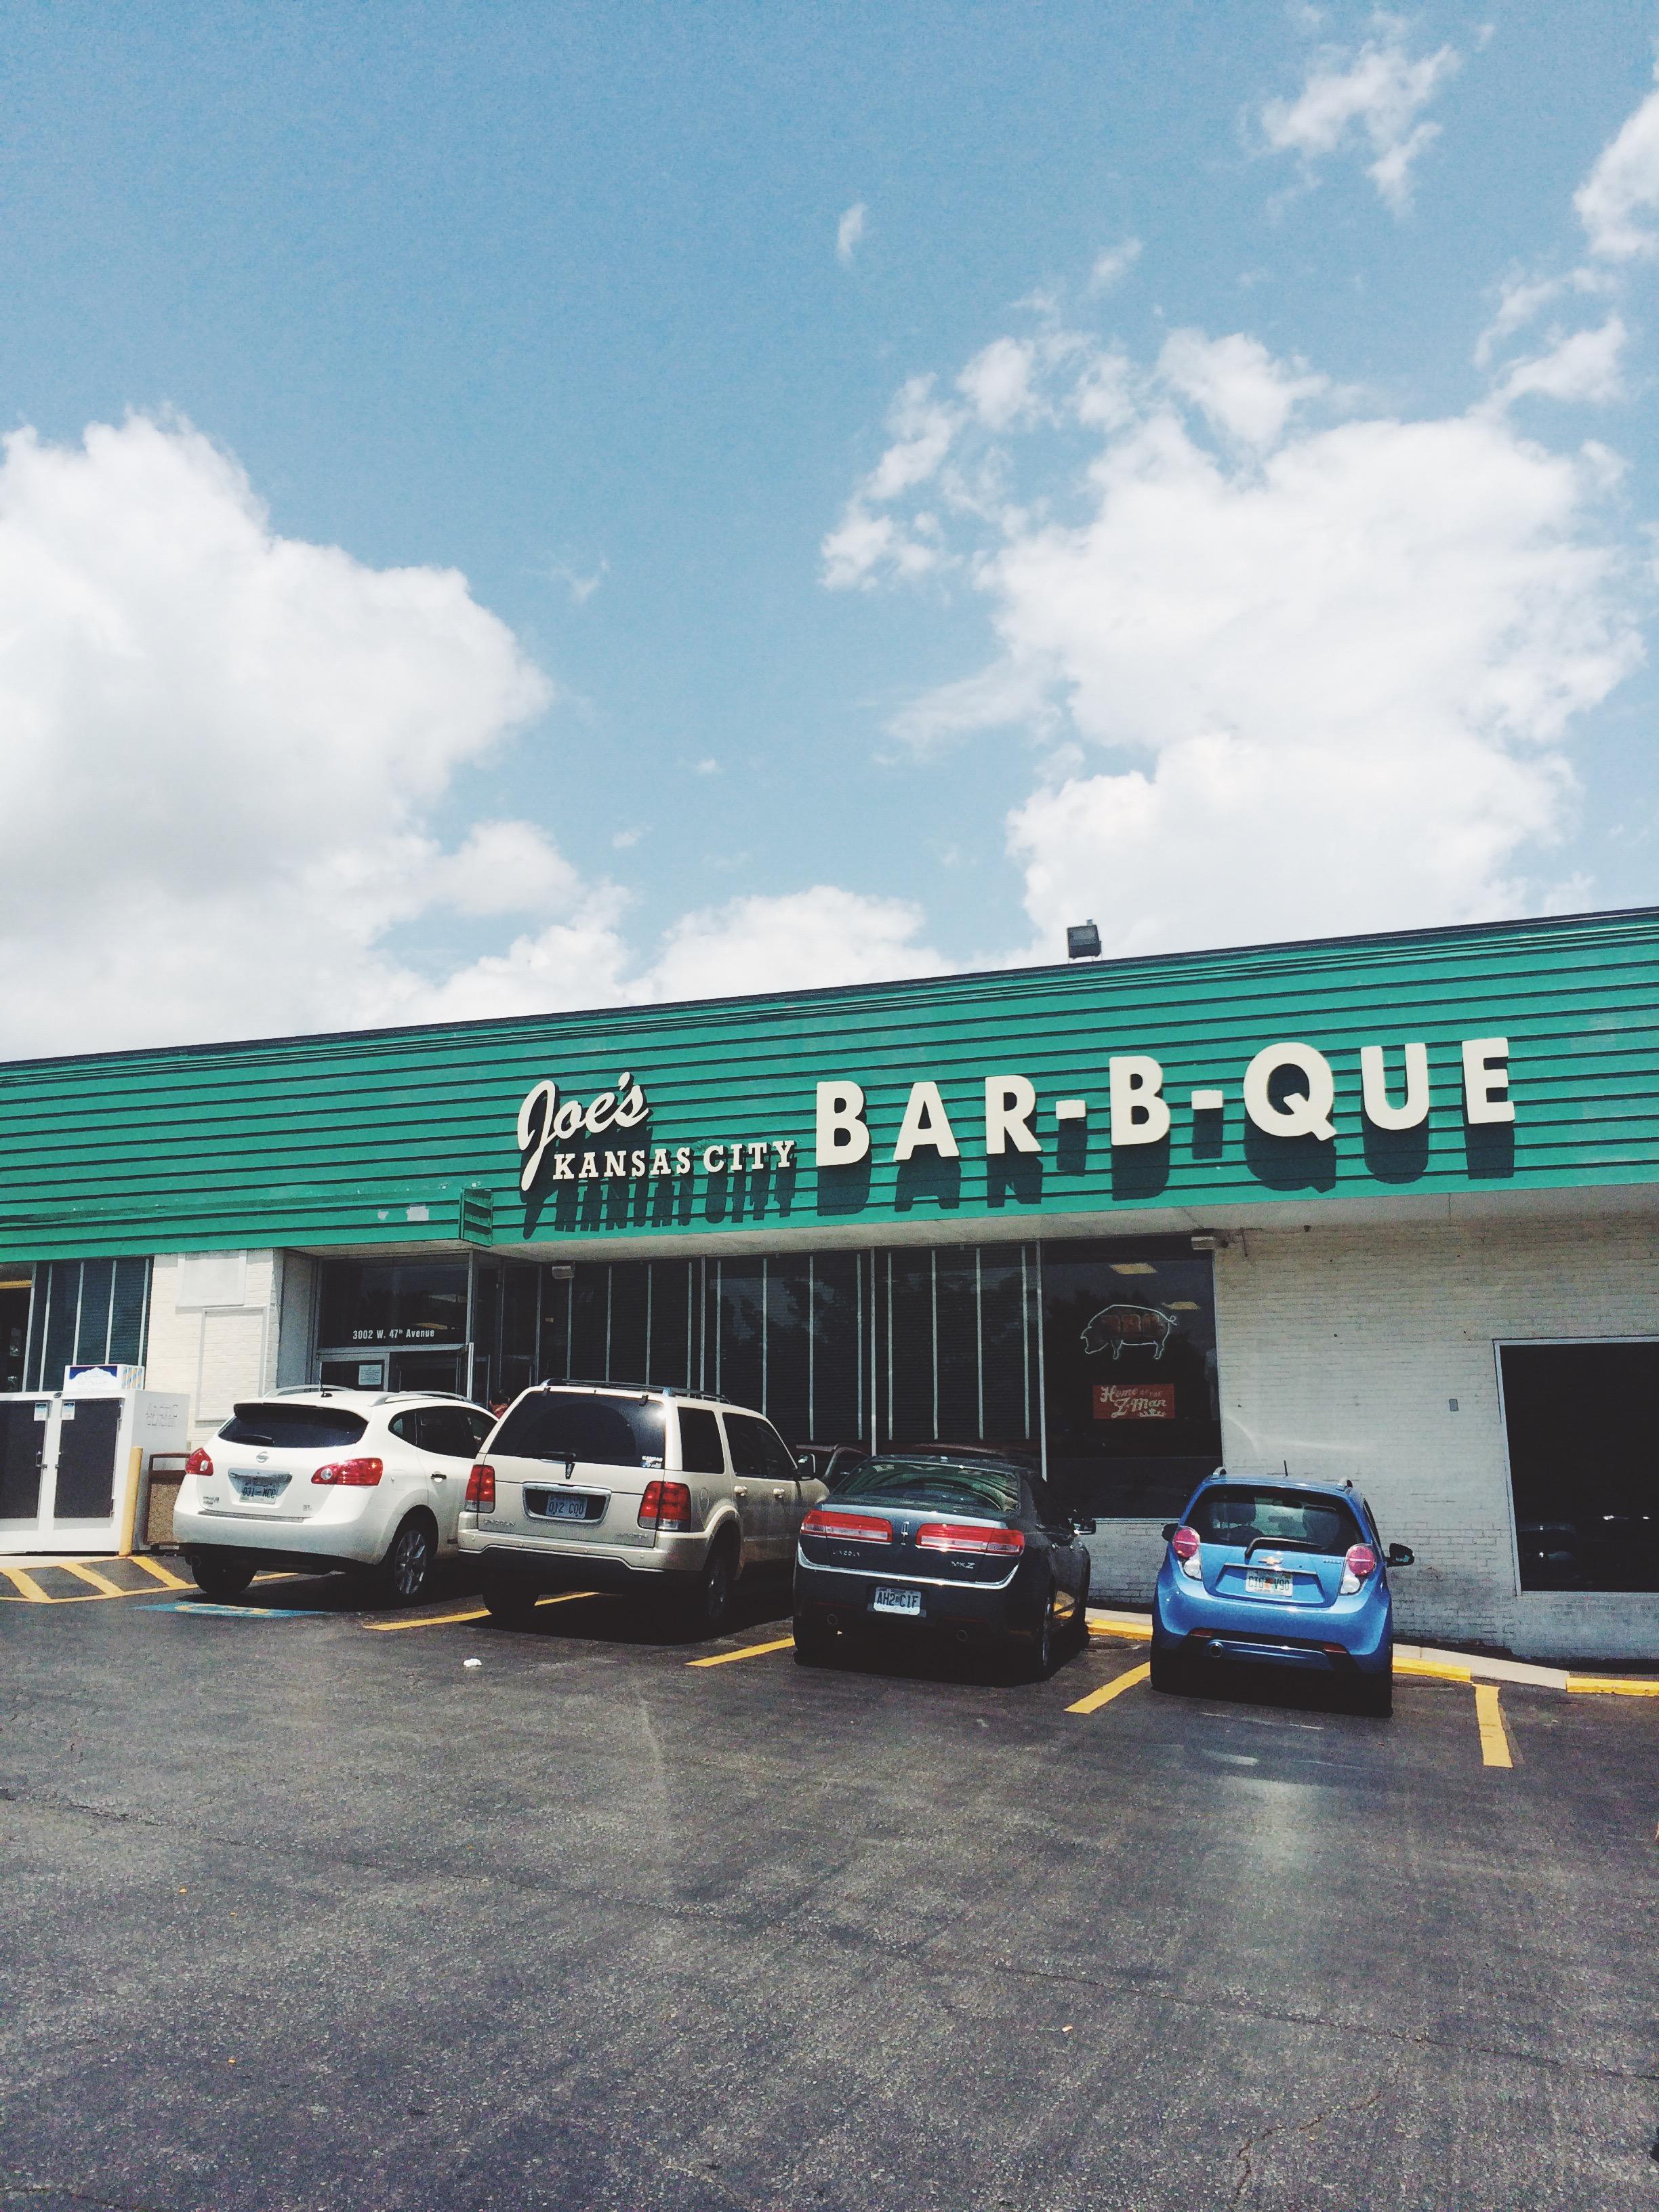 Joe's Bar-B-Que, Kansas City